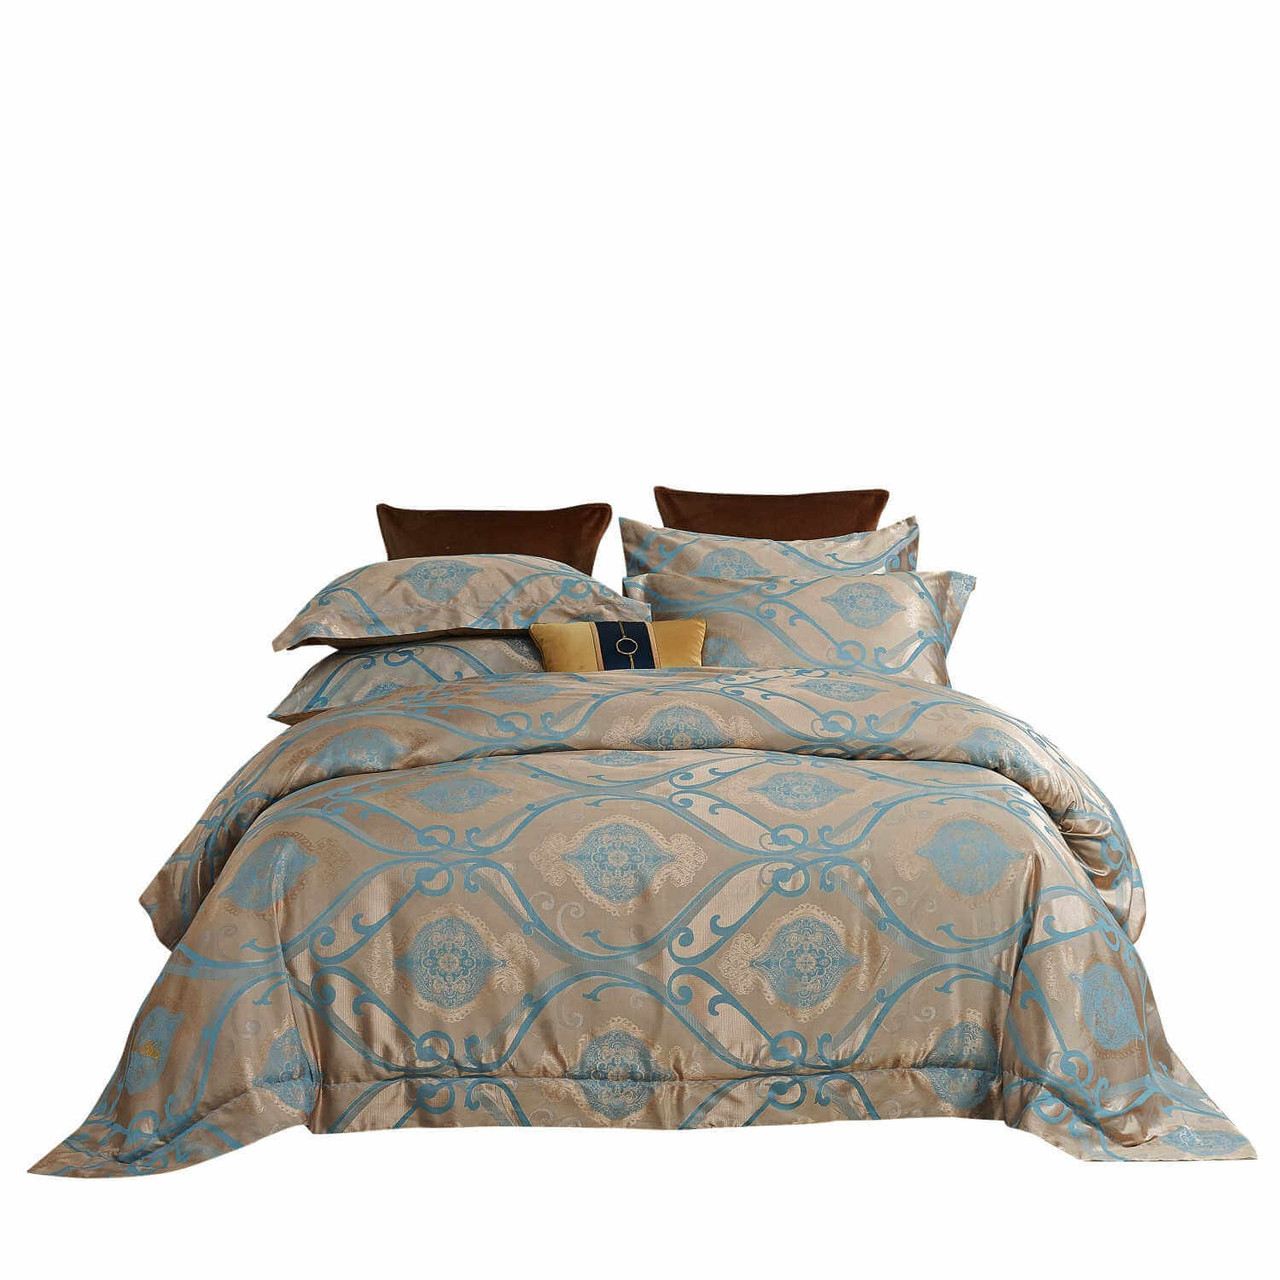 DM804K Dolce-Mela Luxury Bedding Set Wholesale-Dropship